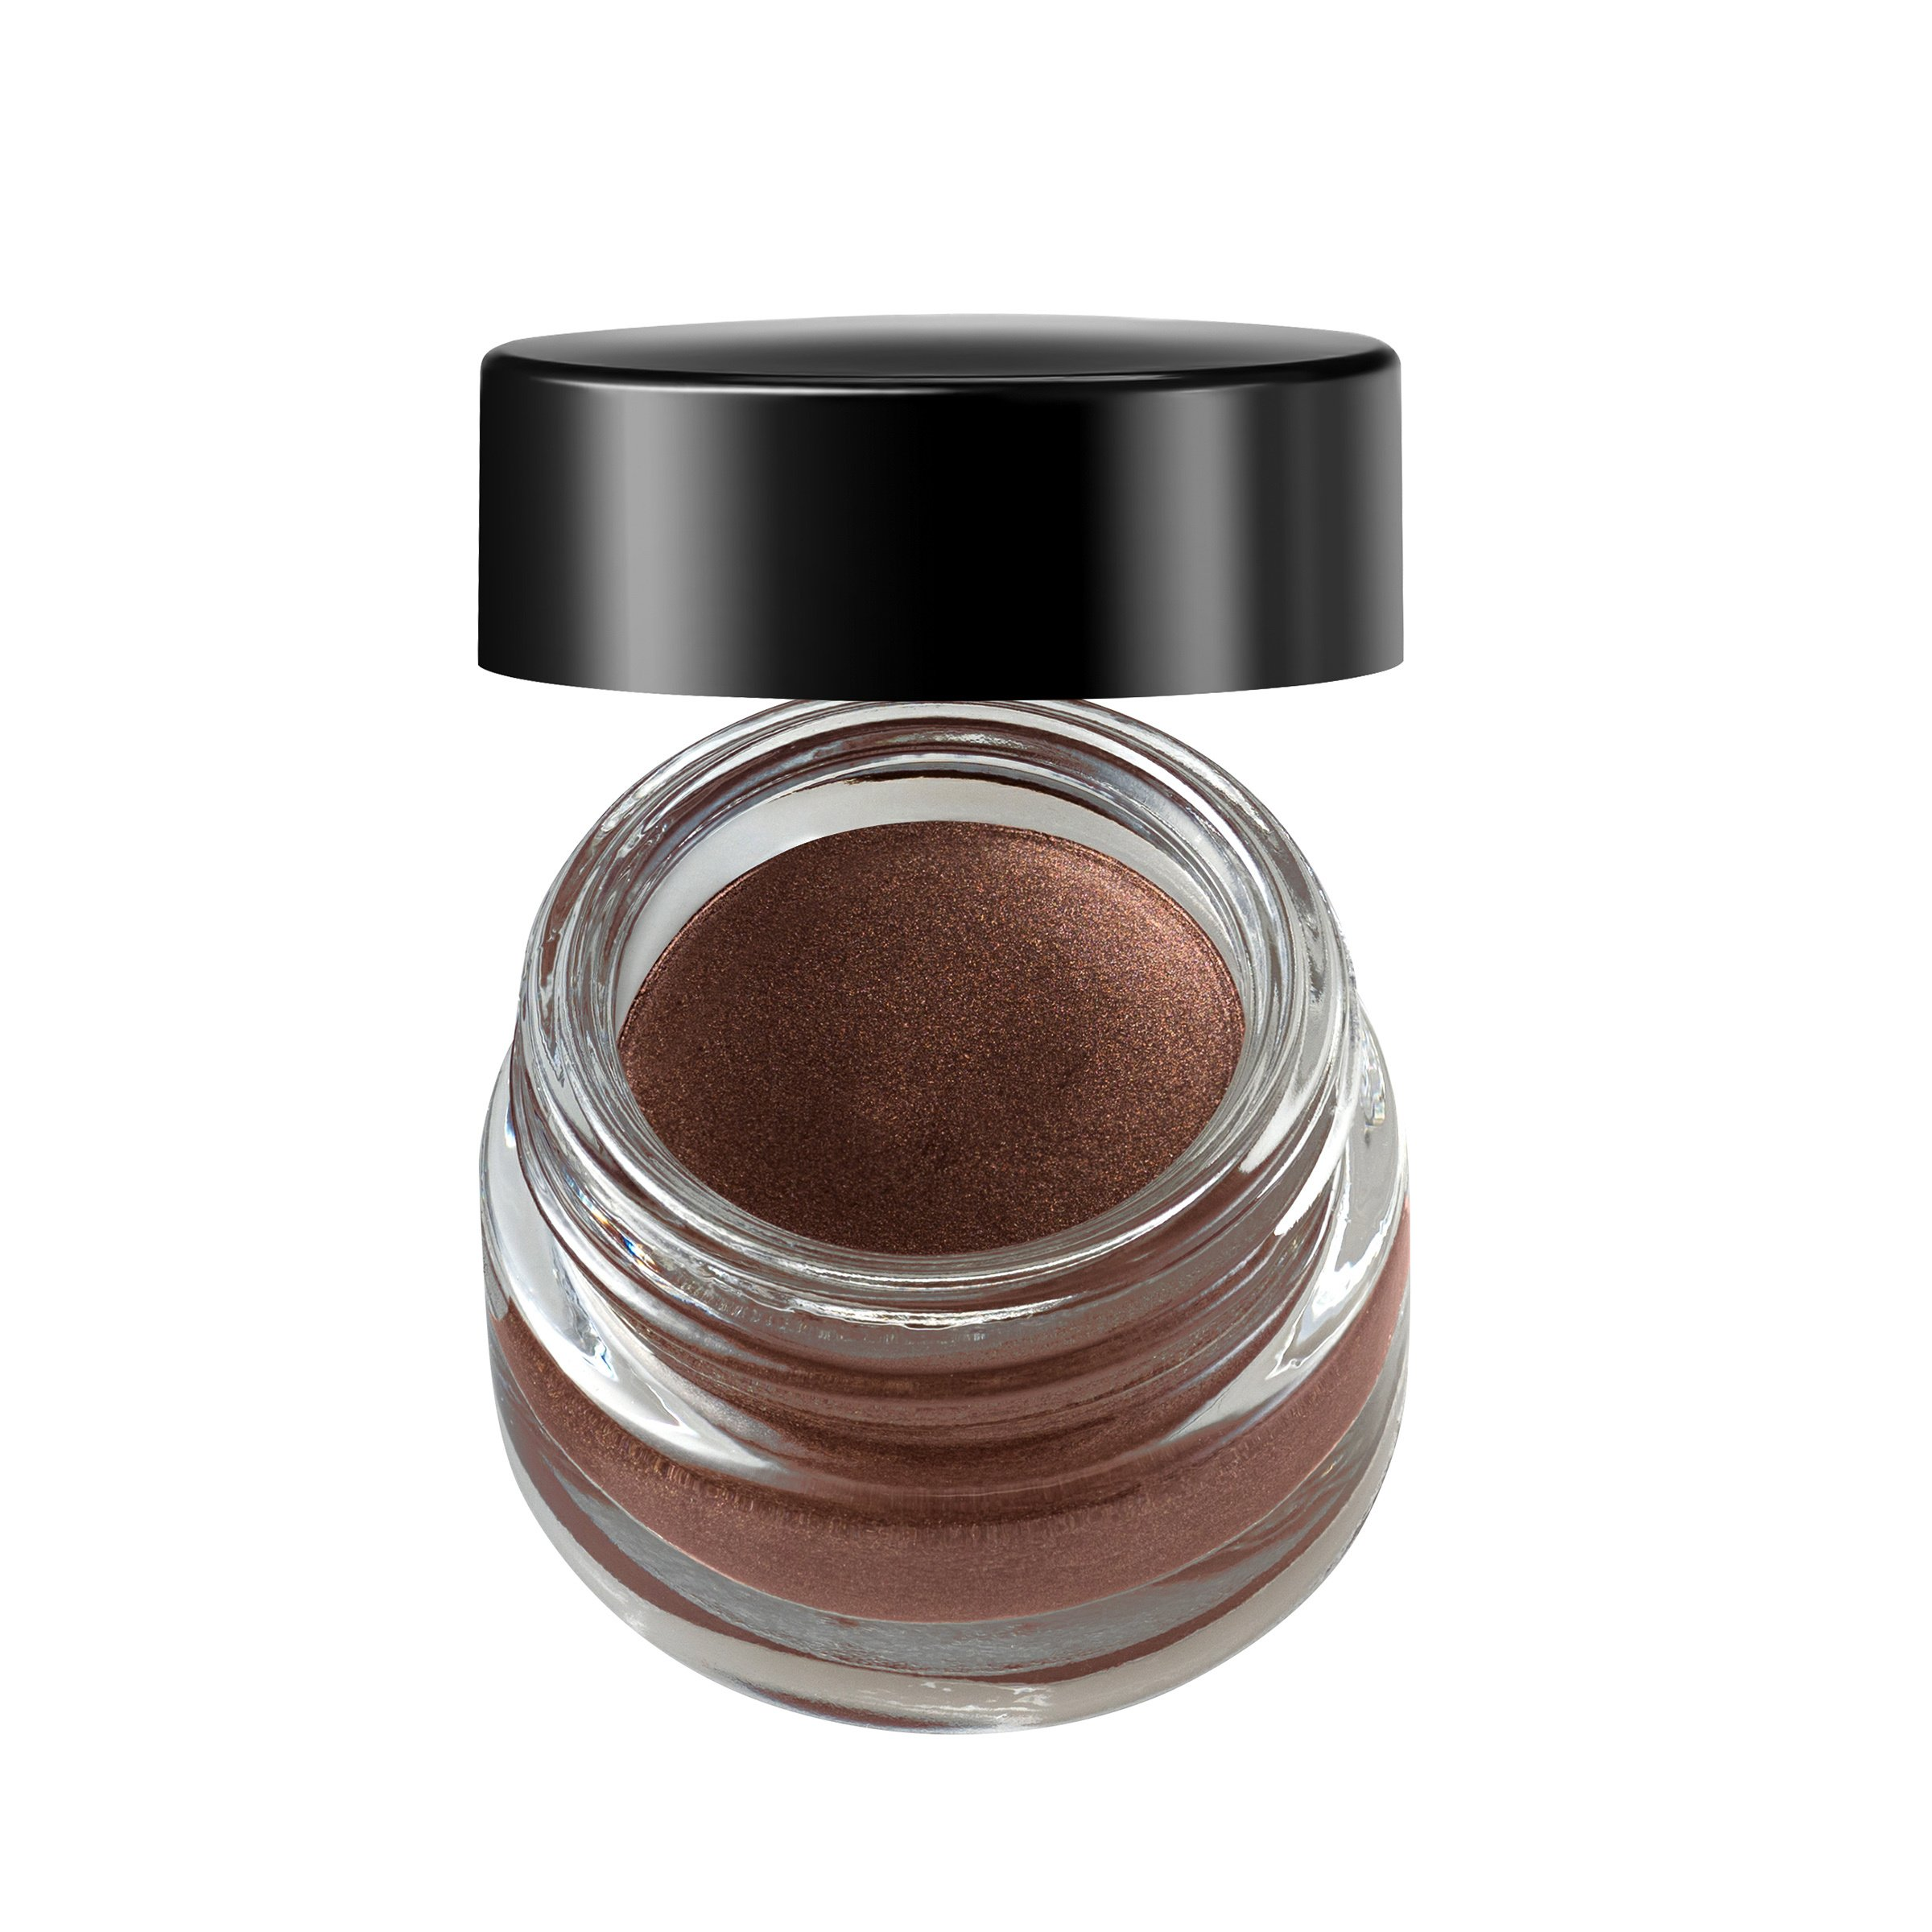 Jolie Waterproof Indelible Creme Eye Shadow 3g (Beyond Bronze)